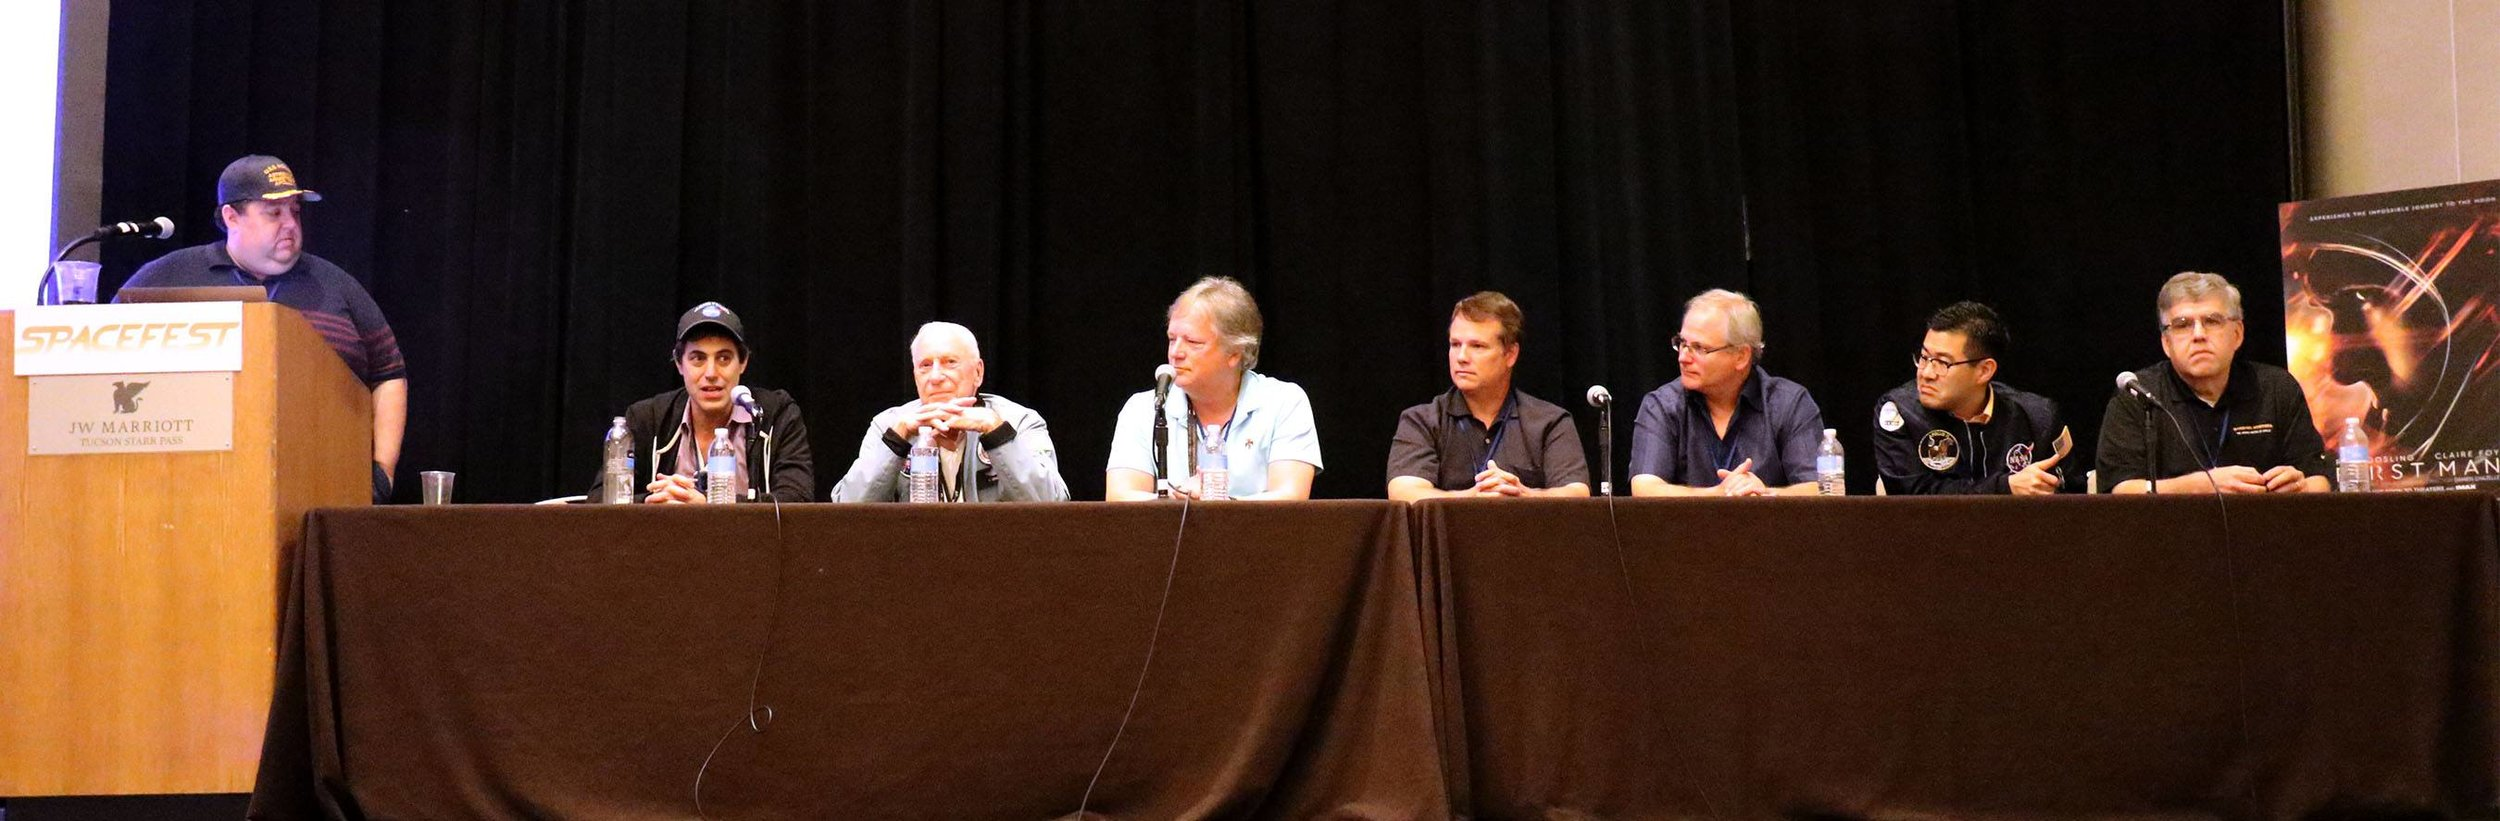 L-R: Moderator Robert Pearlman, Josh Singer, Al Worden, Rick Armstrong, Mark Armstrong, Chris Calle, Ryan Nagata, and Rick Houston. (Photo: Tom Usciak)